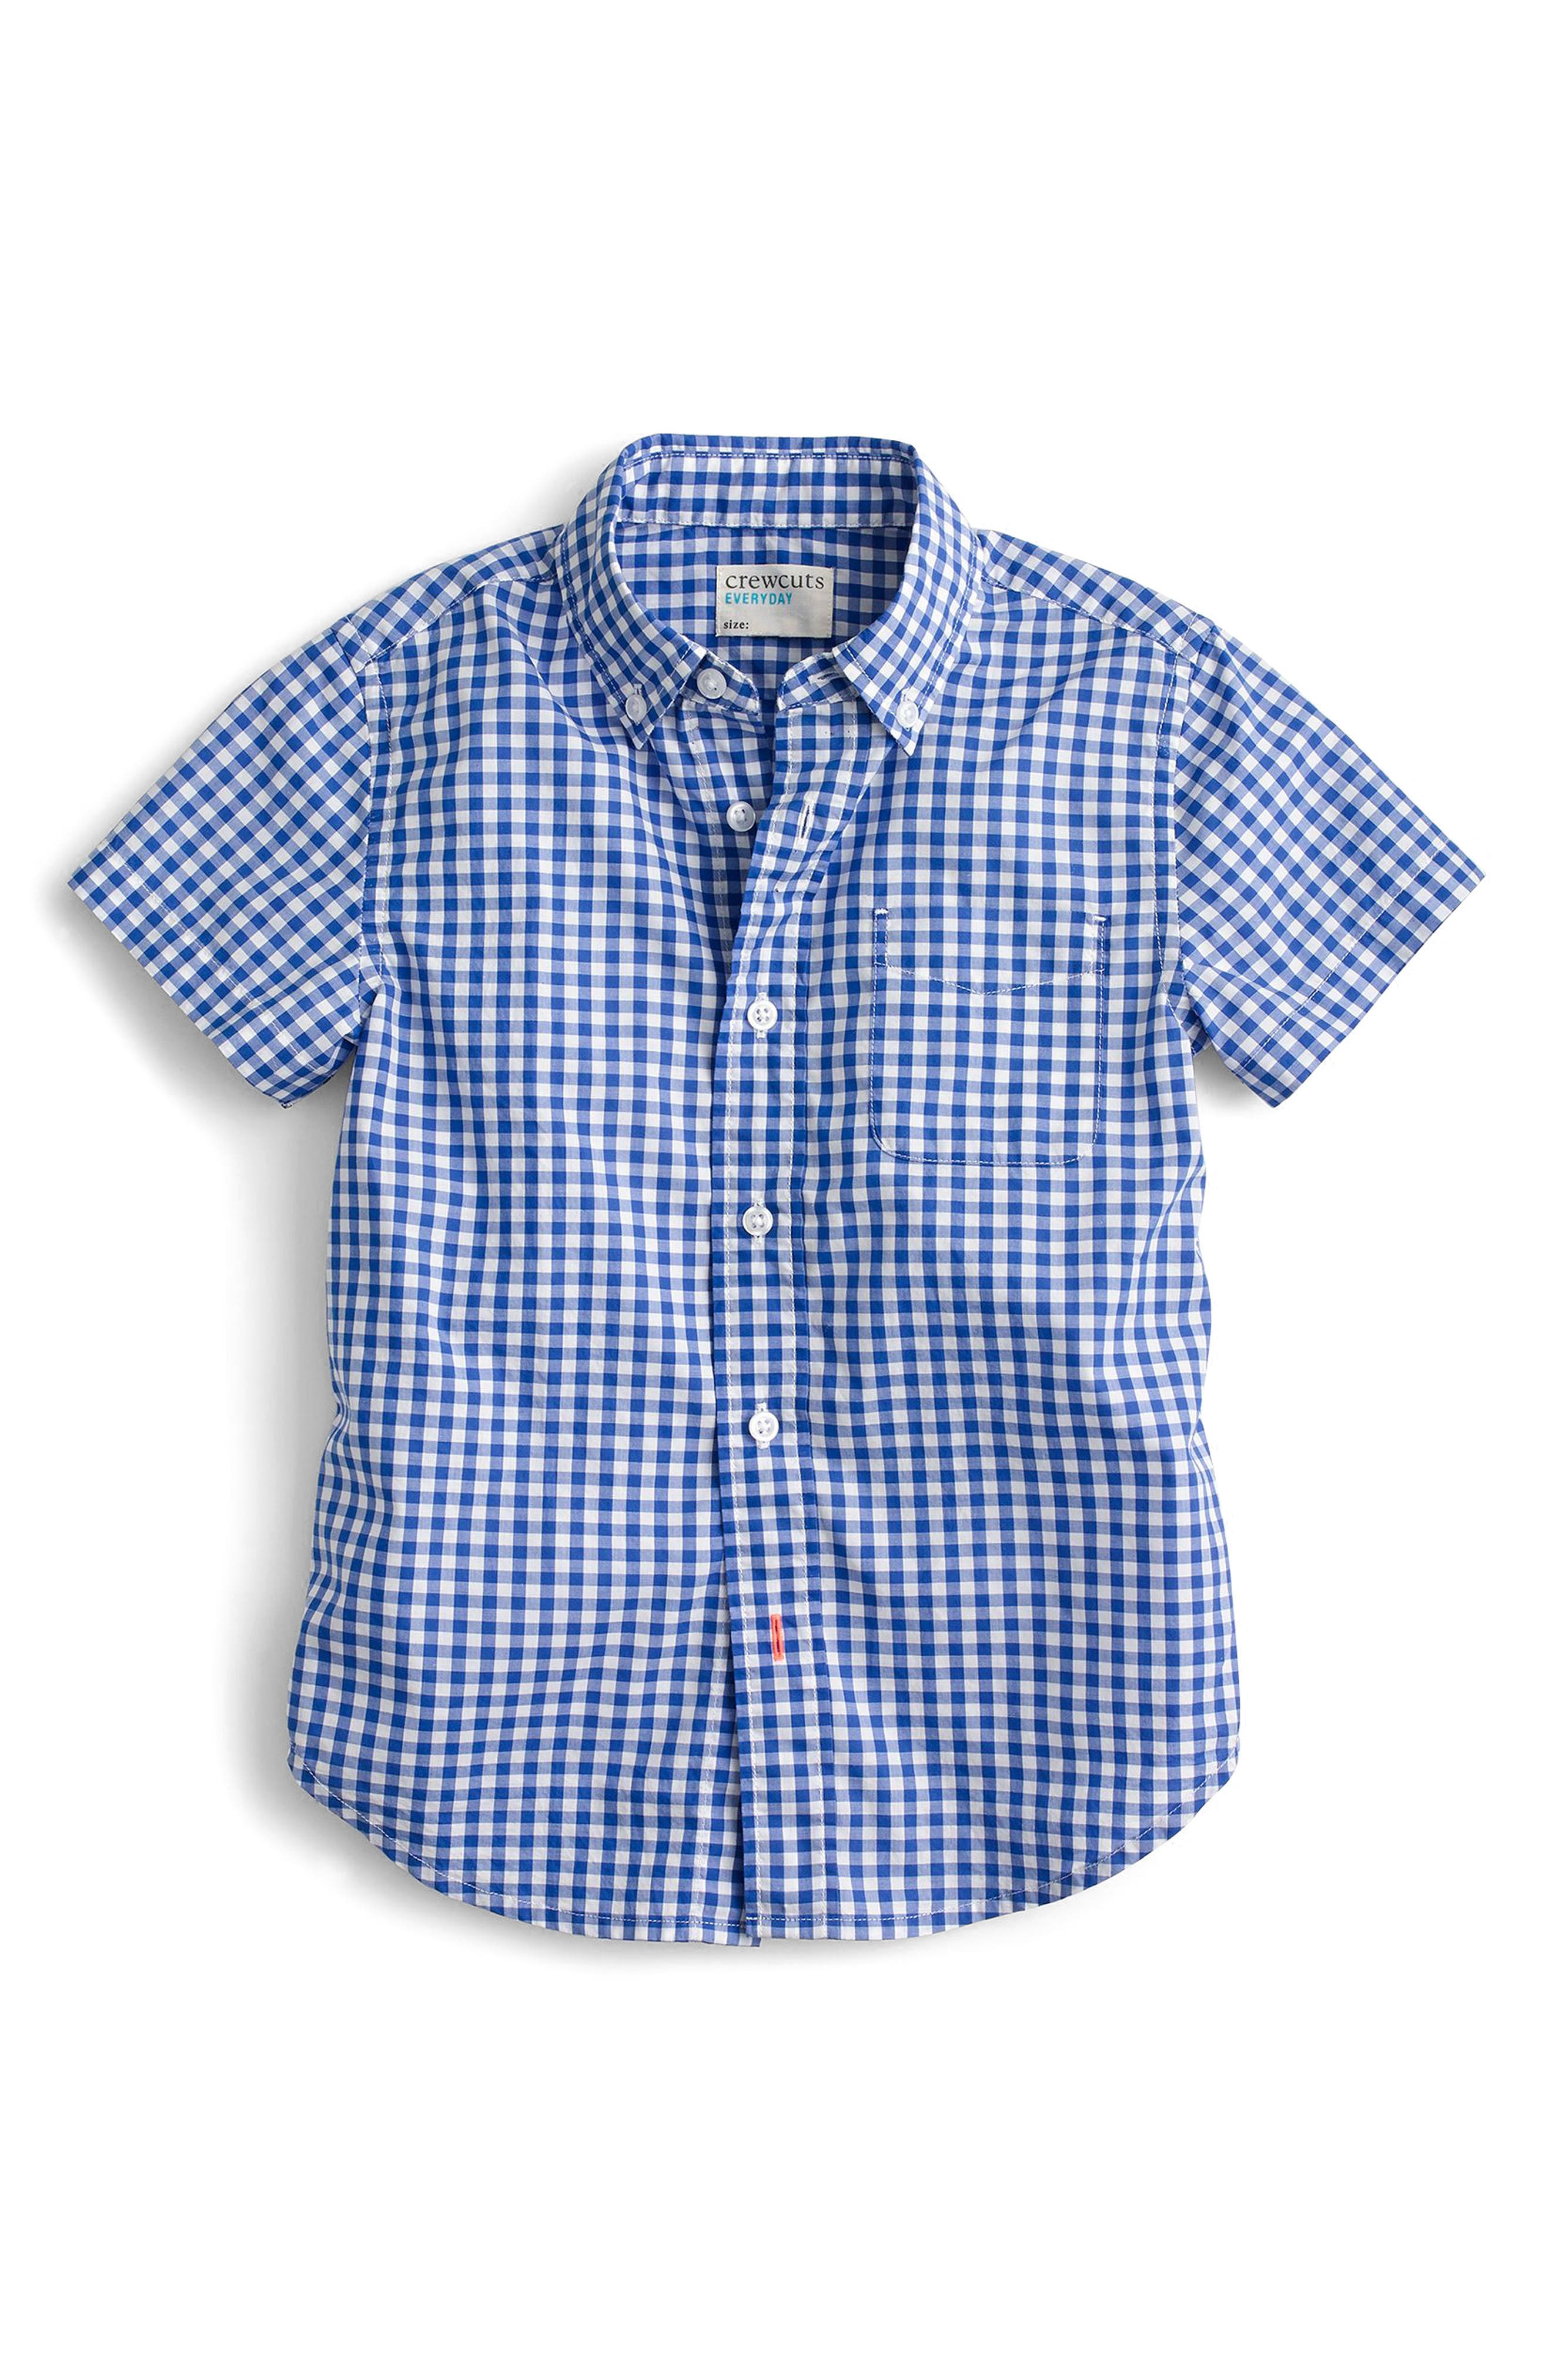 Secret Wash Short Sleeve Gingham Shirt,                         Main,                         color, Rain Blue White